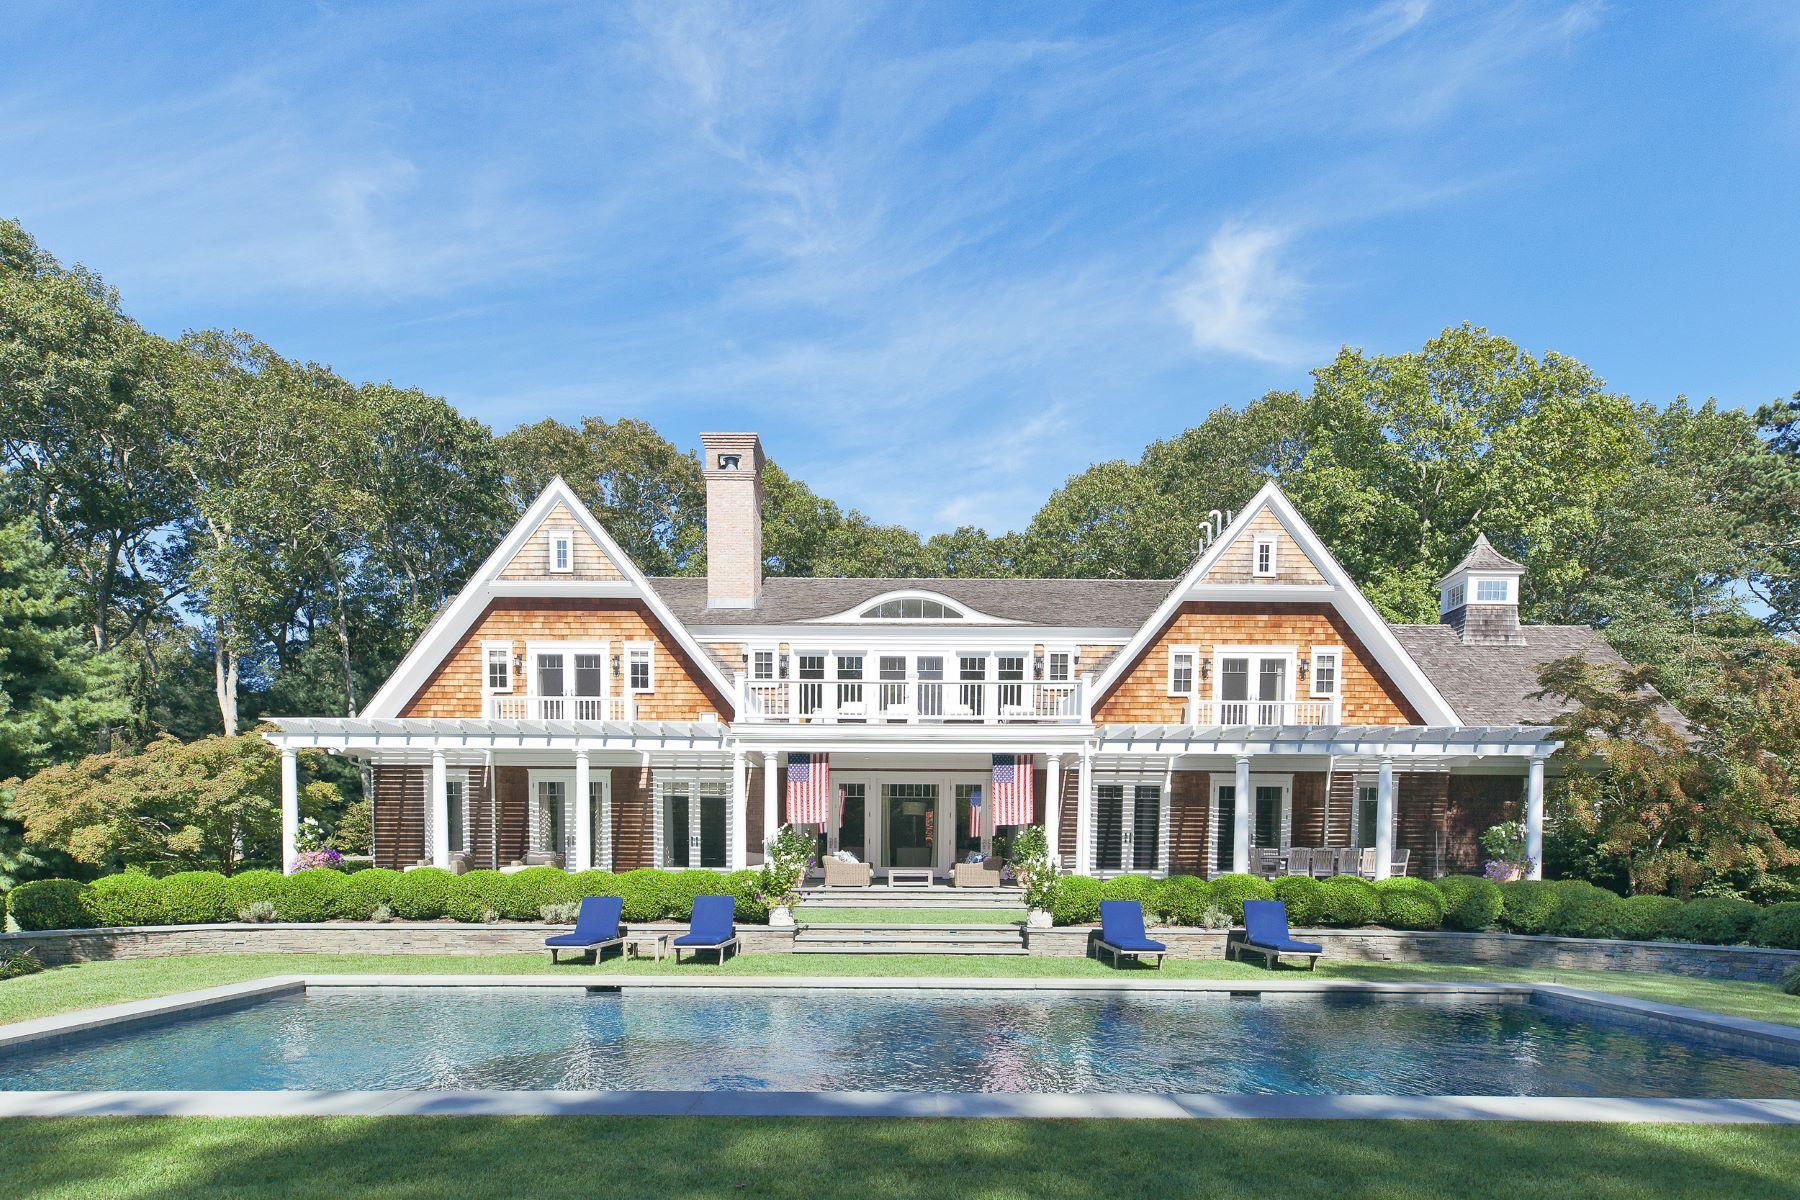 Single Family Homes for Sale at Georgica Estate 10 Jones Cove Road East Hampton, New York 11937 United States